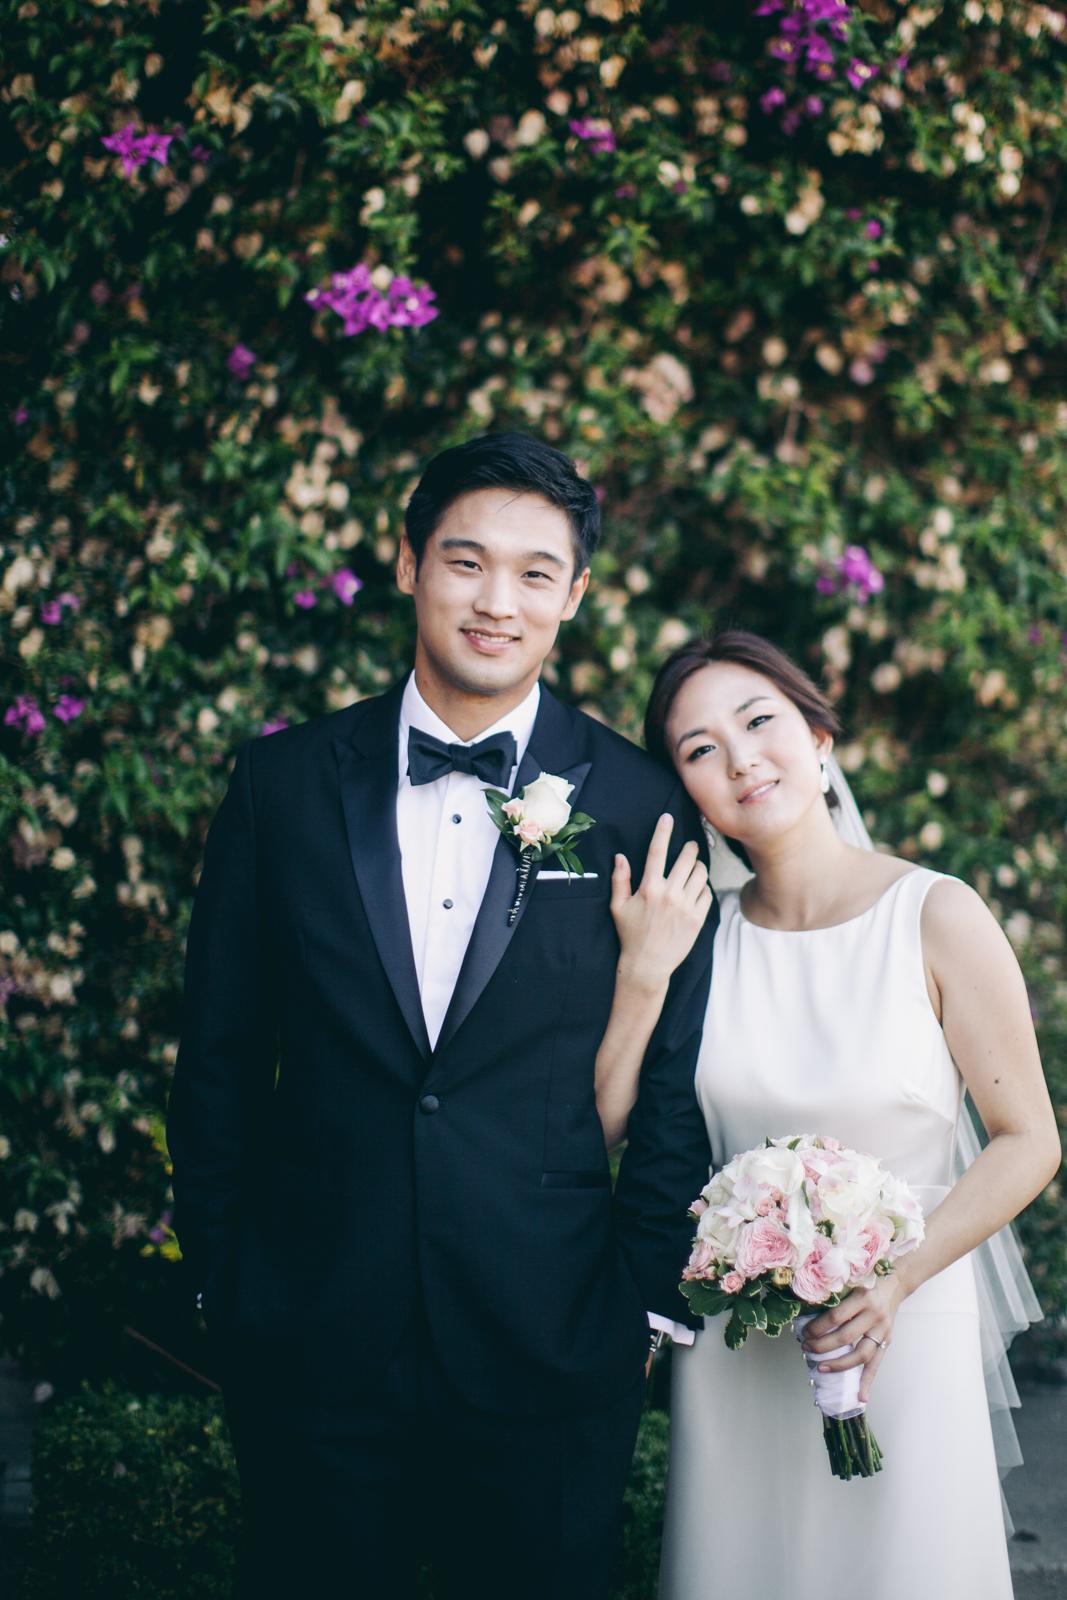 kohl_manison_wedding_photography_sarah_eric_ebony_siovhan_bokeh_photography_030.jpg